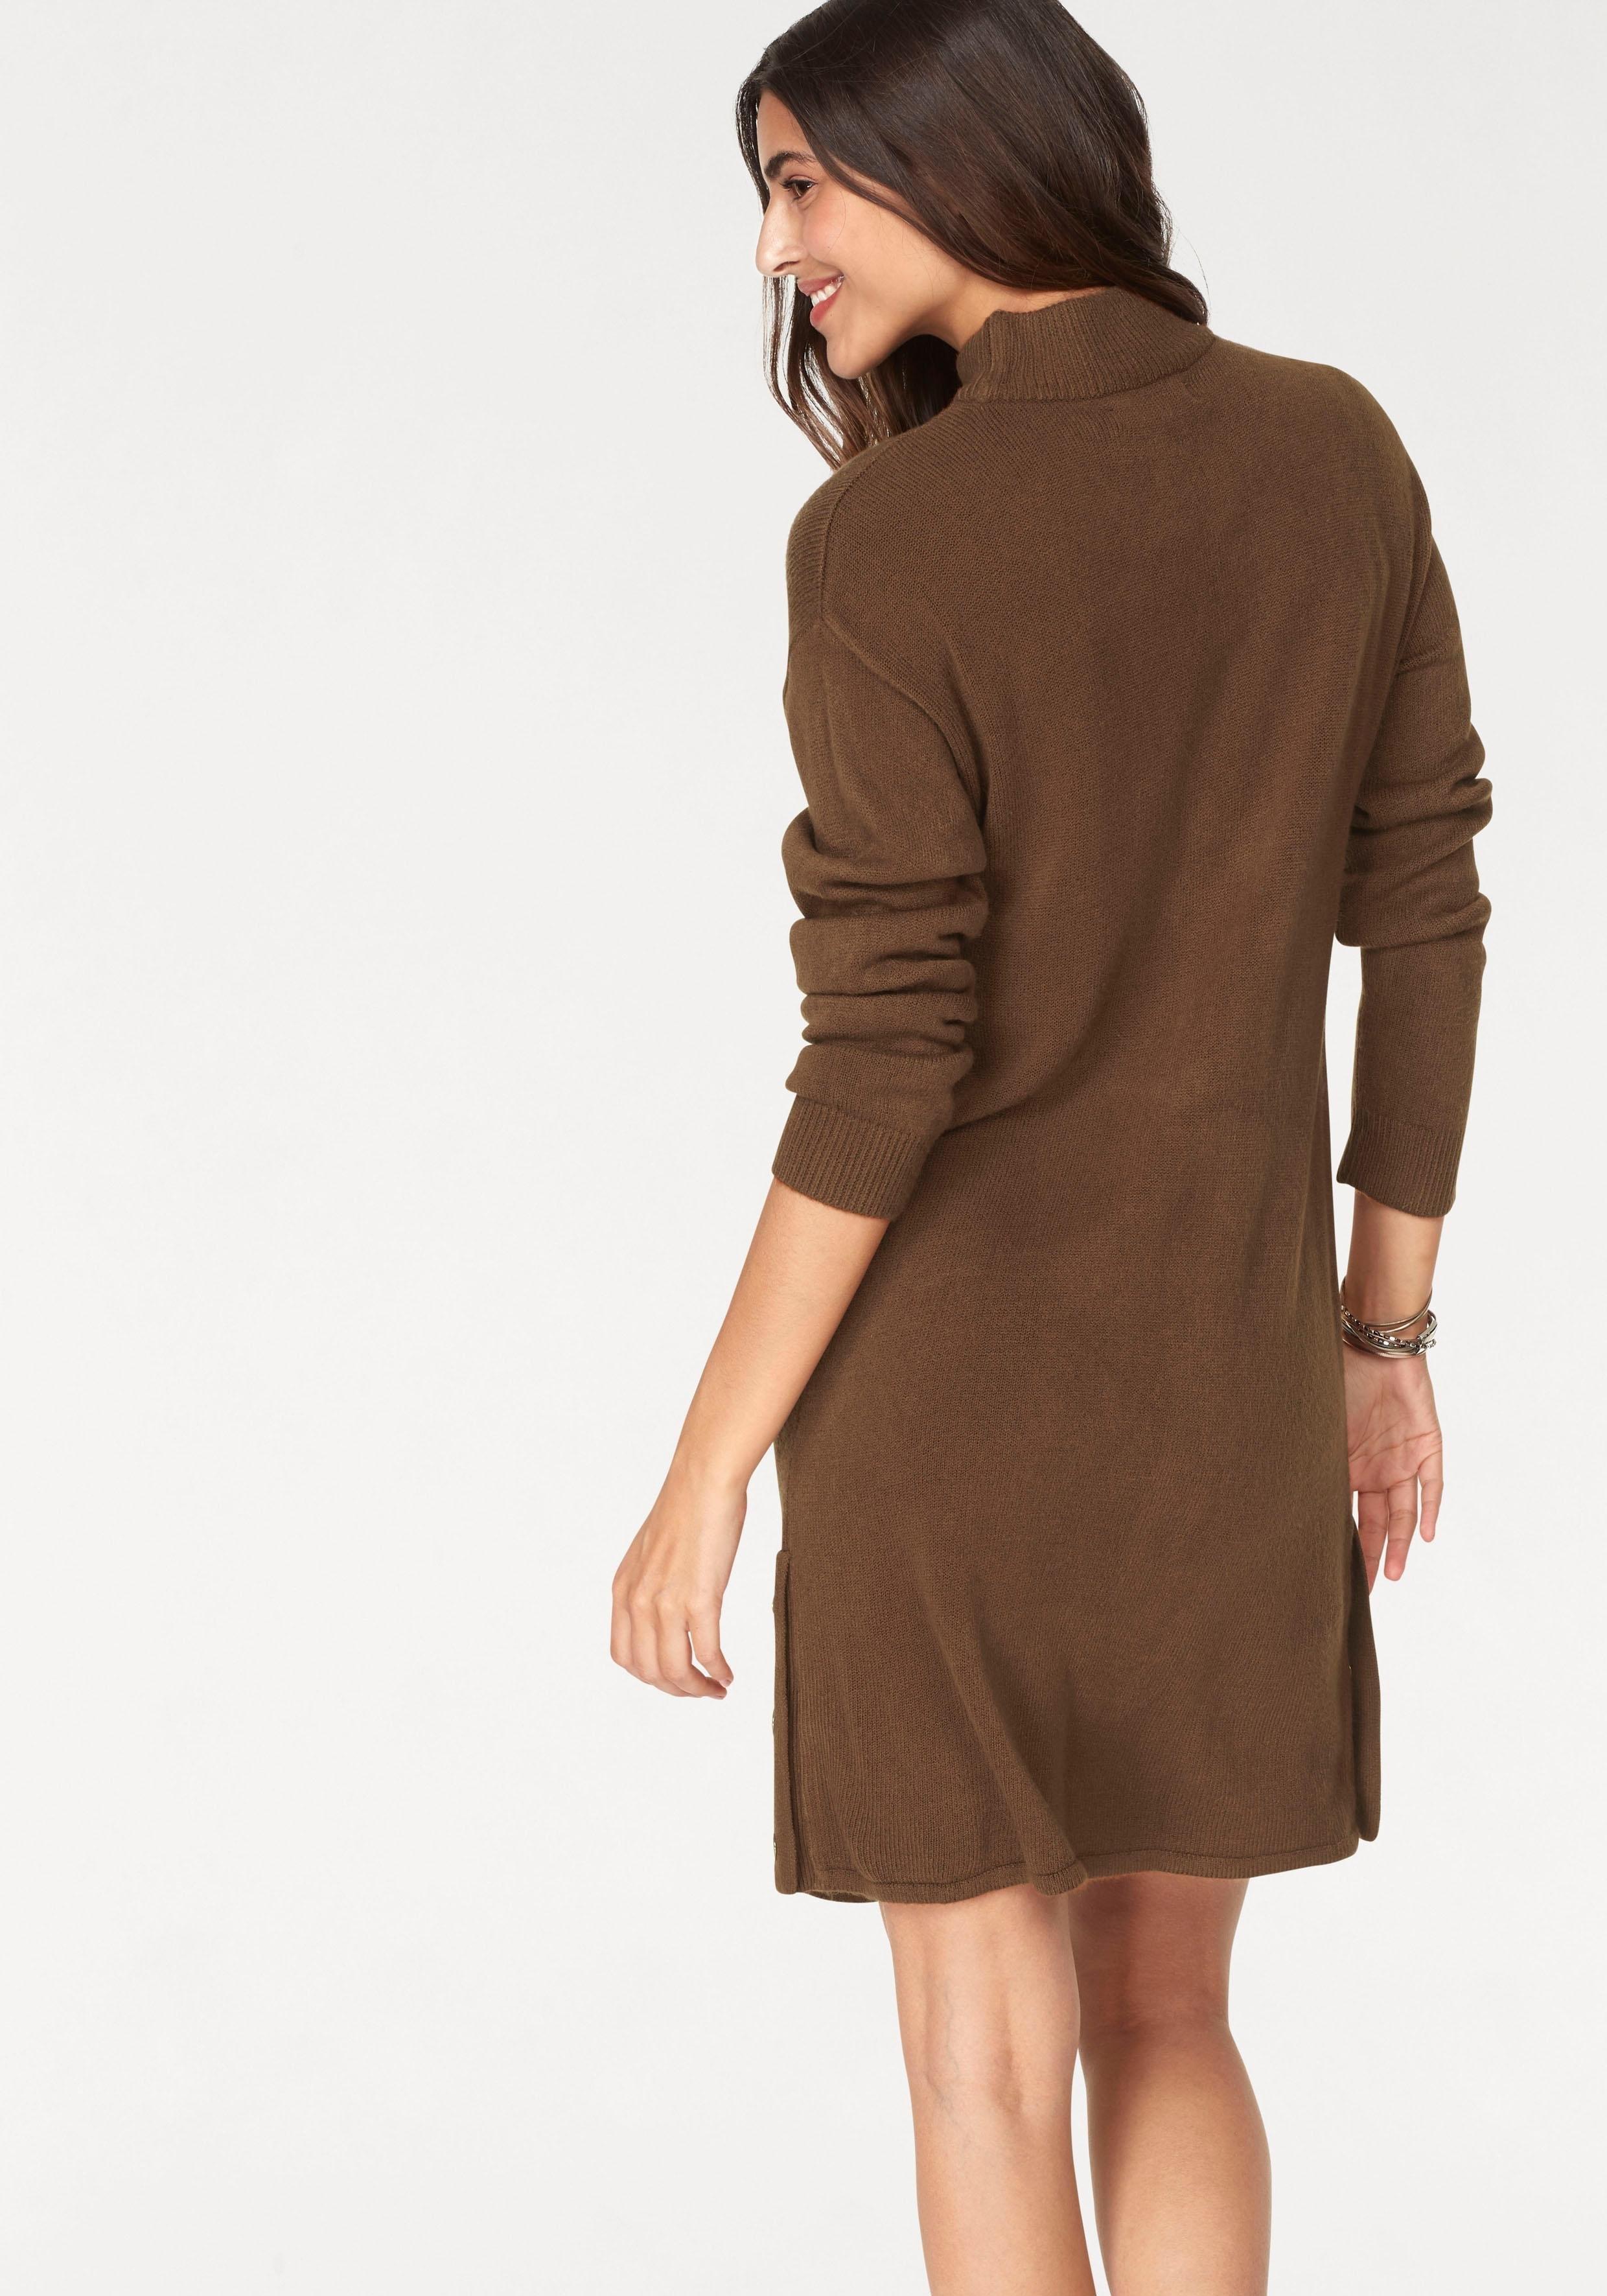 8690945840555c b.young gebreide jurk »Malea«  Bestel nu bij